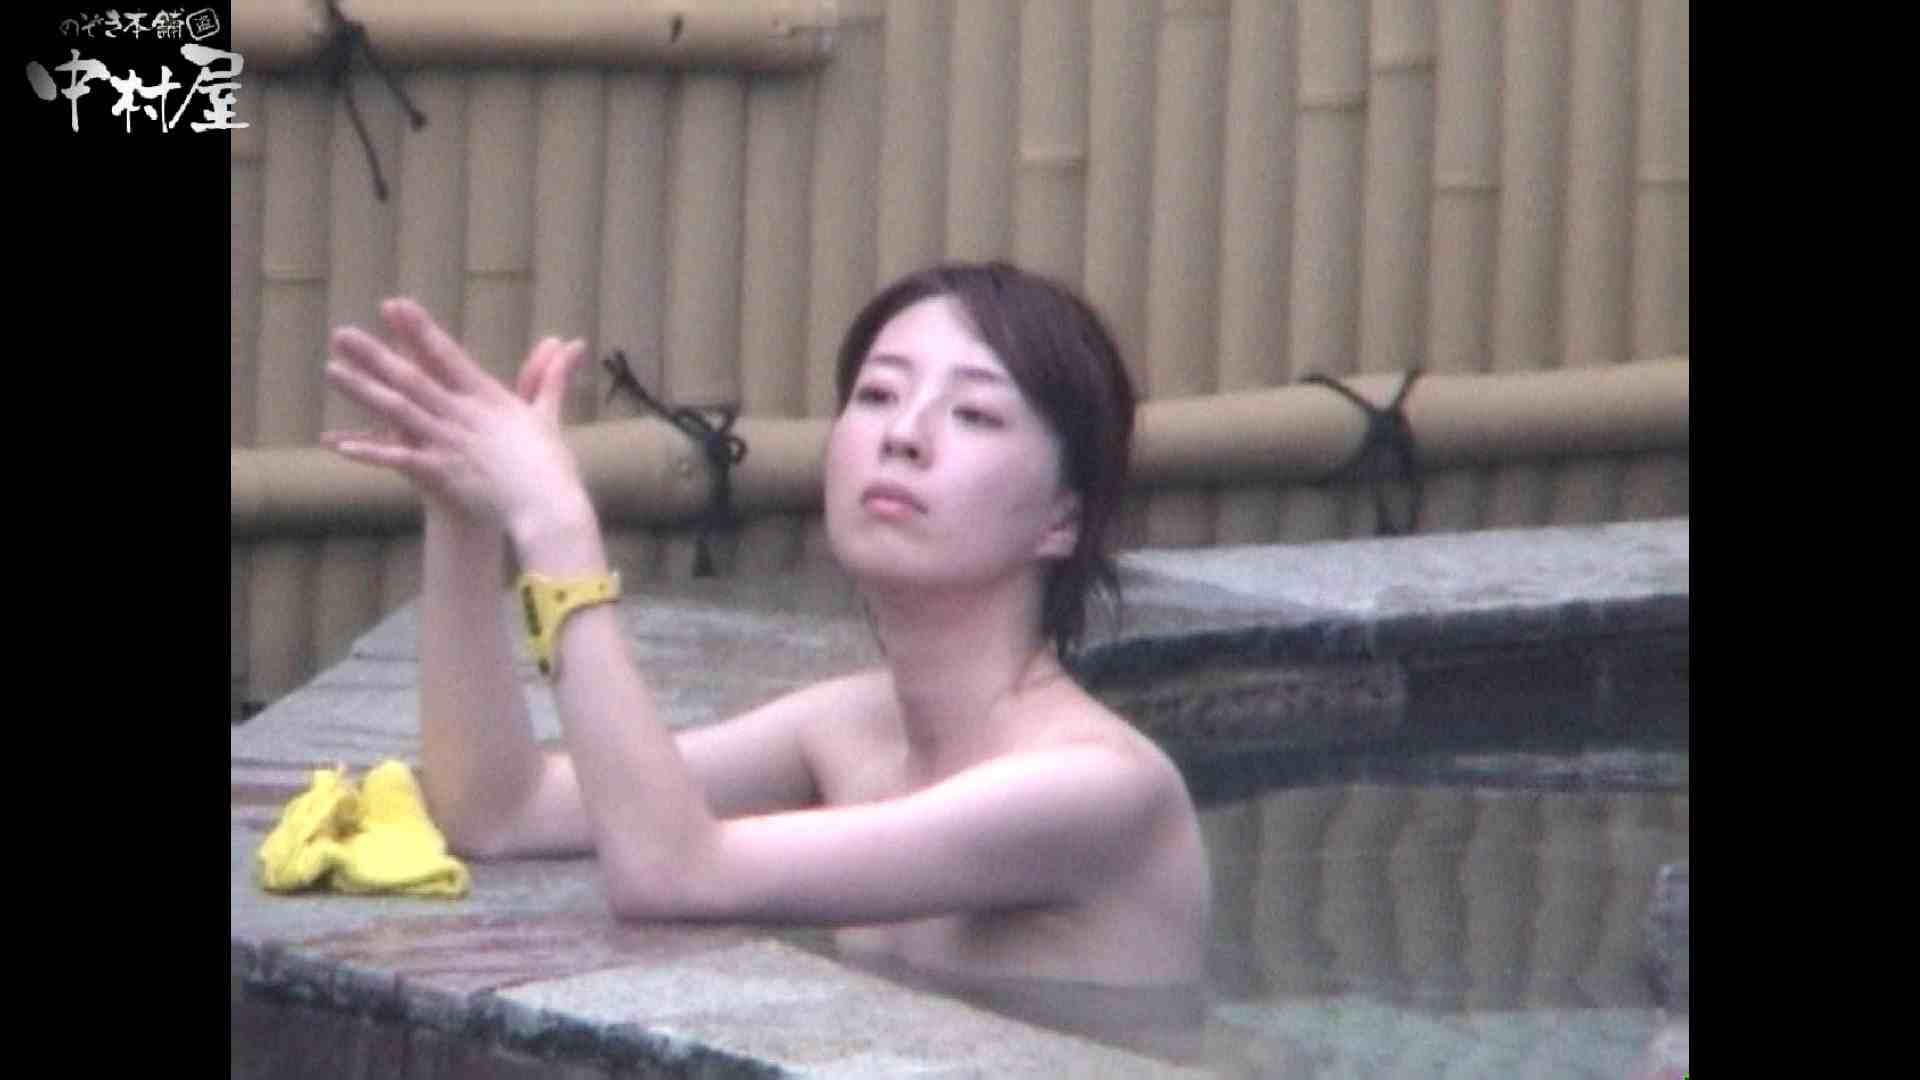 Aquaな露天風呂Vol.964 0  30連発 12